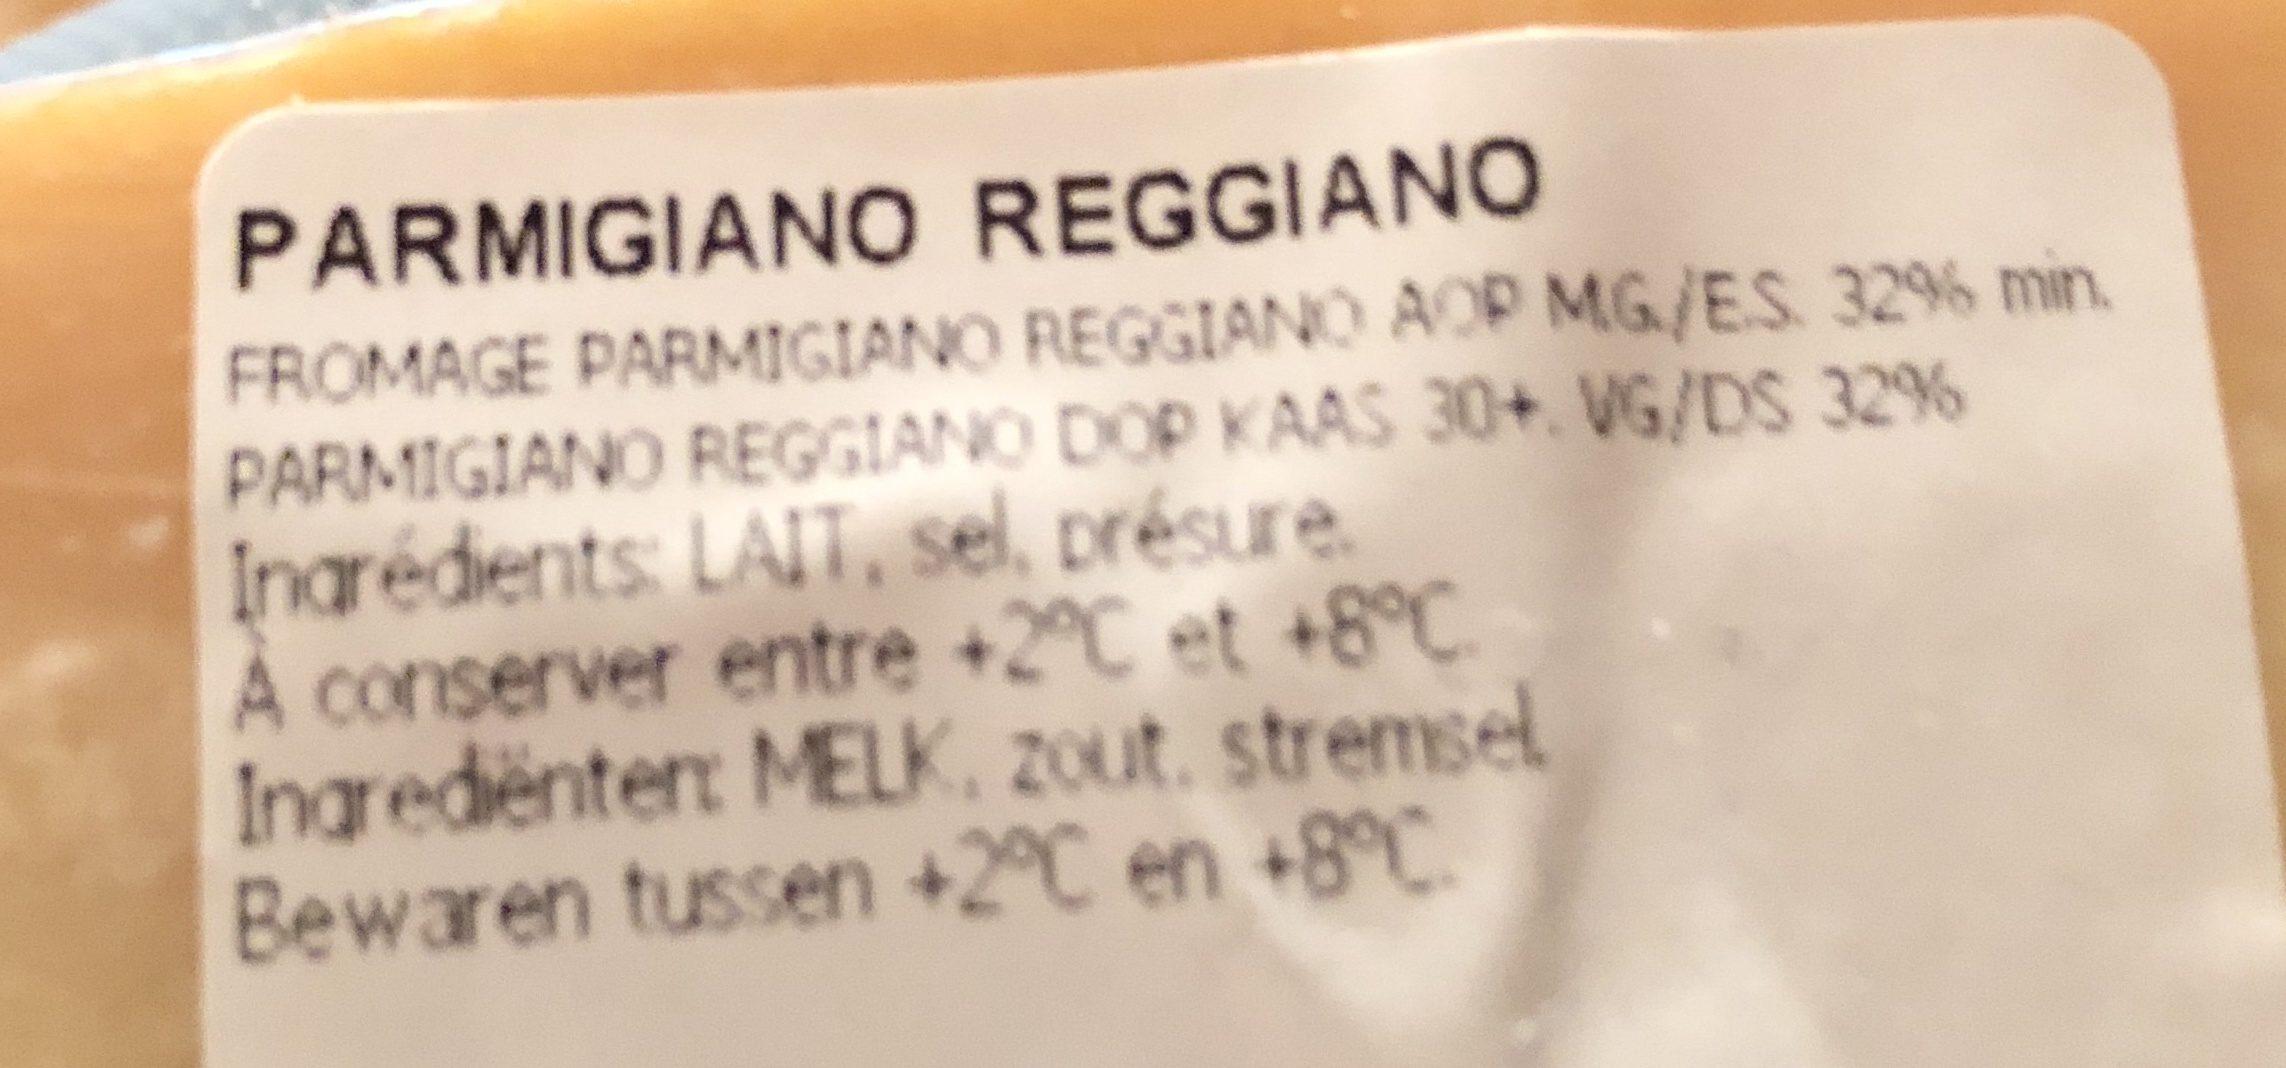 Parmigiano reggiano - Ingredienti - fr